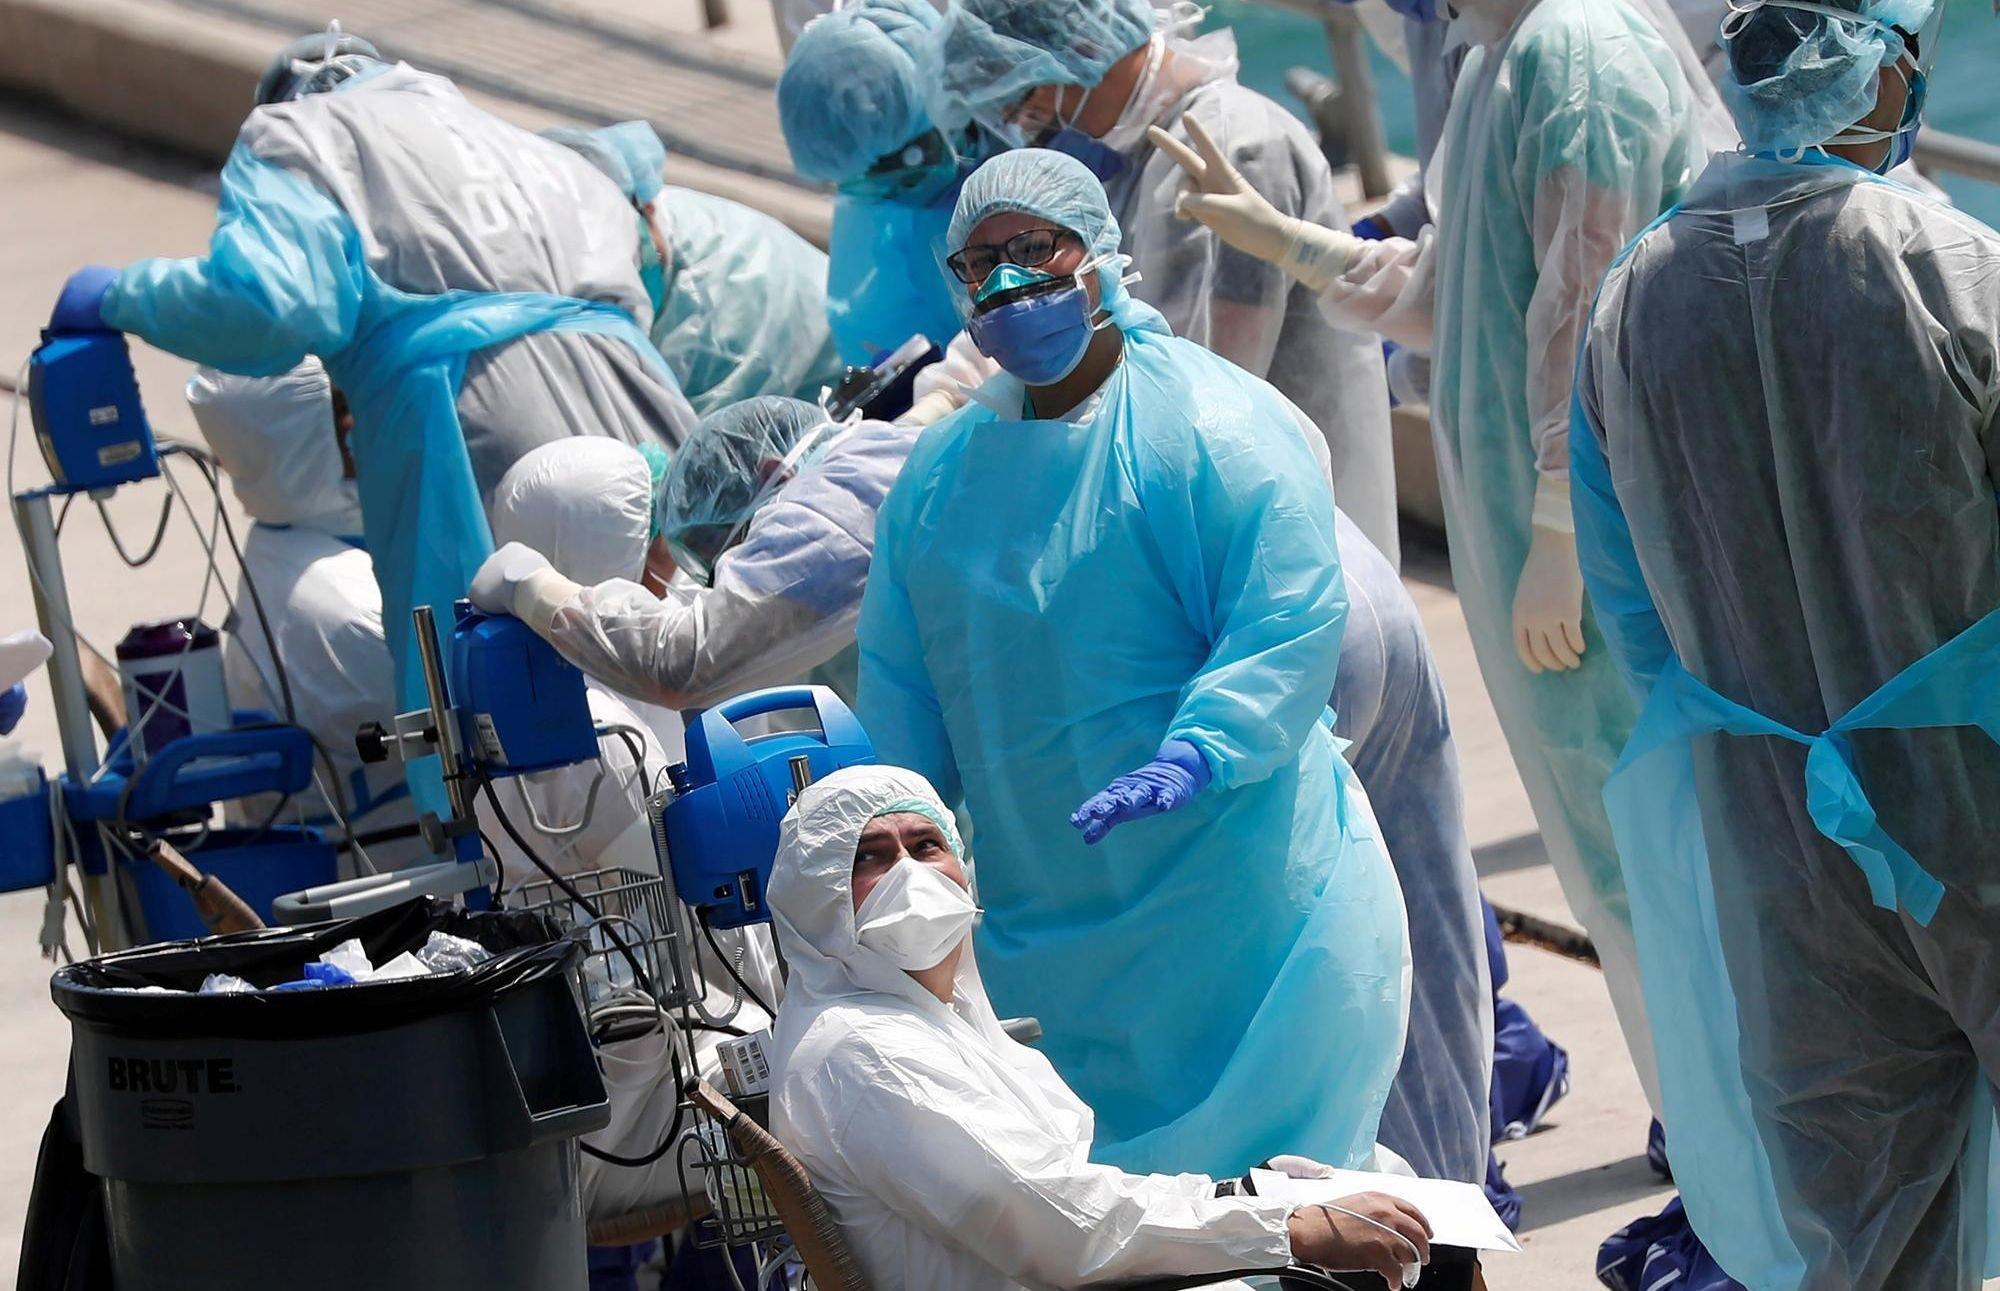 ABŞ-da koronavirus qurbanlarının sayı 75 mini ötdü